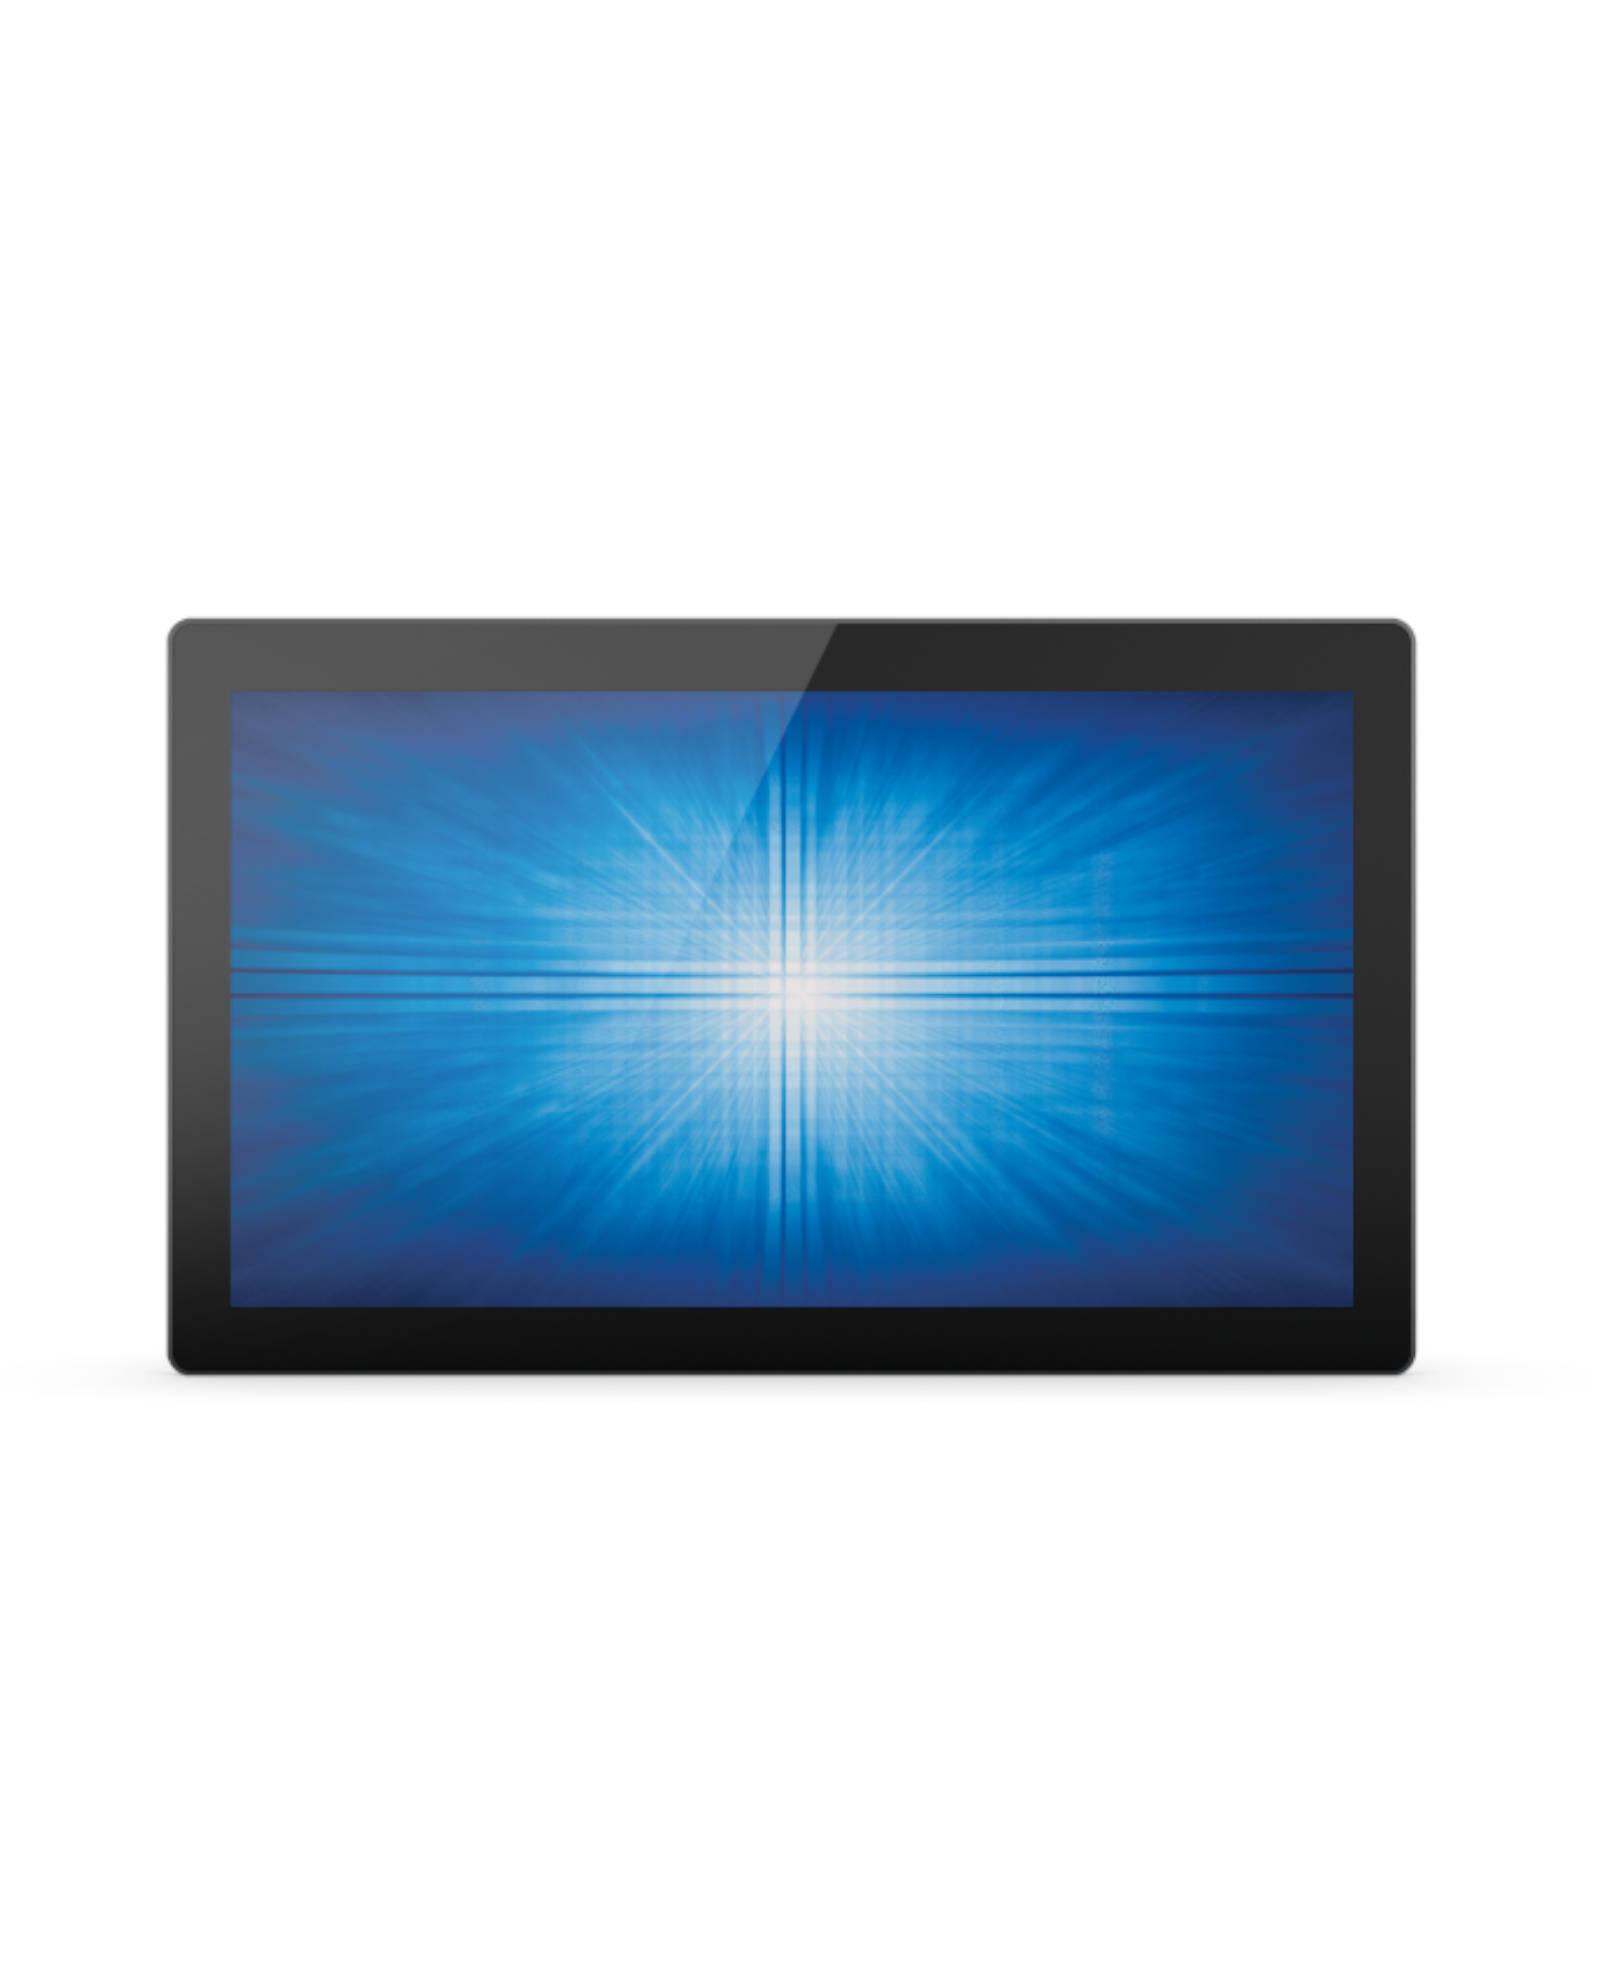 Elo 2094l 19.5inch Open Frame Touchscreen2